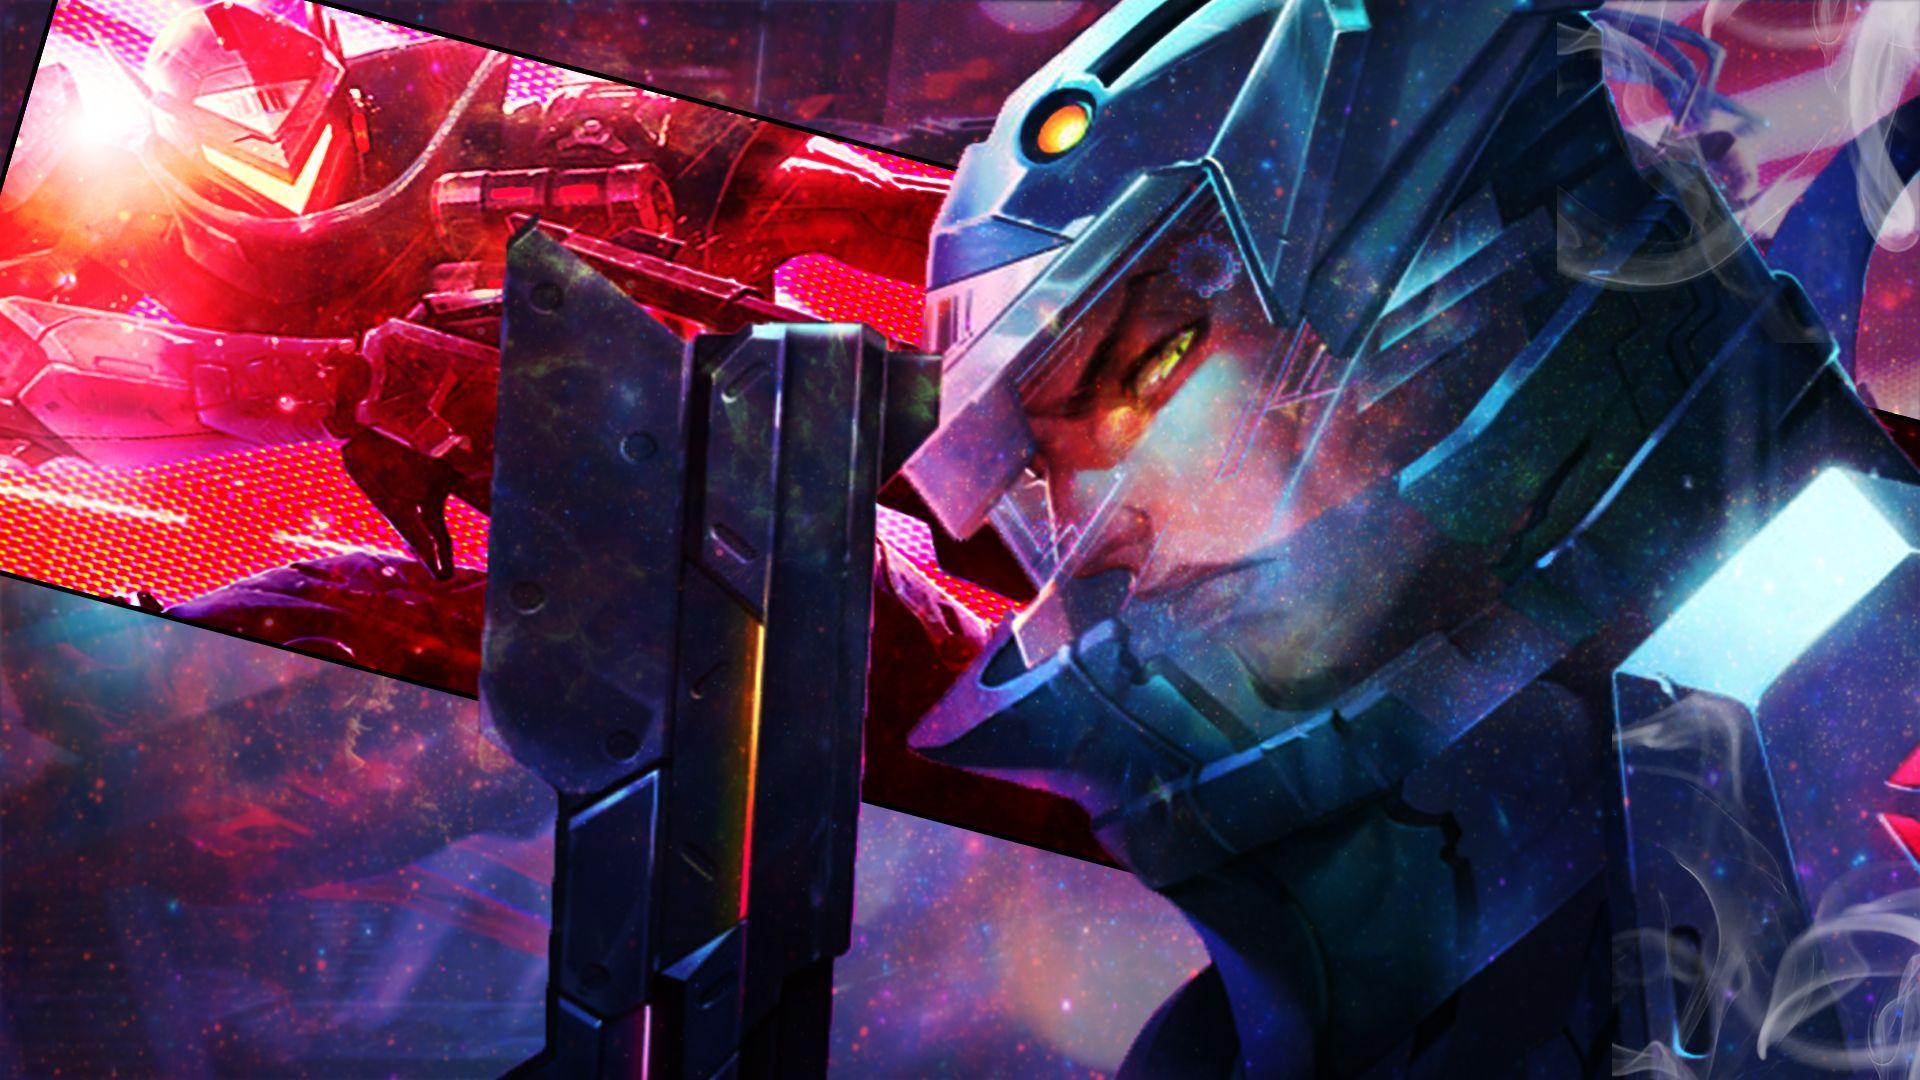 League Of Legends Lucian Background As Wallpaper HD   Sotoak 1920x1080